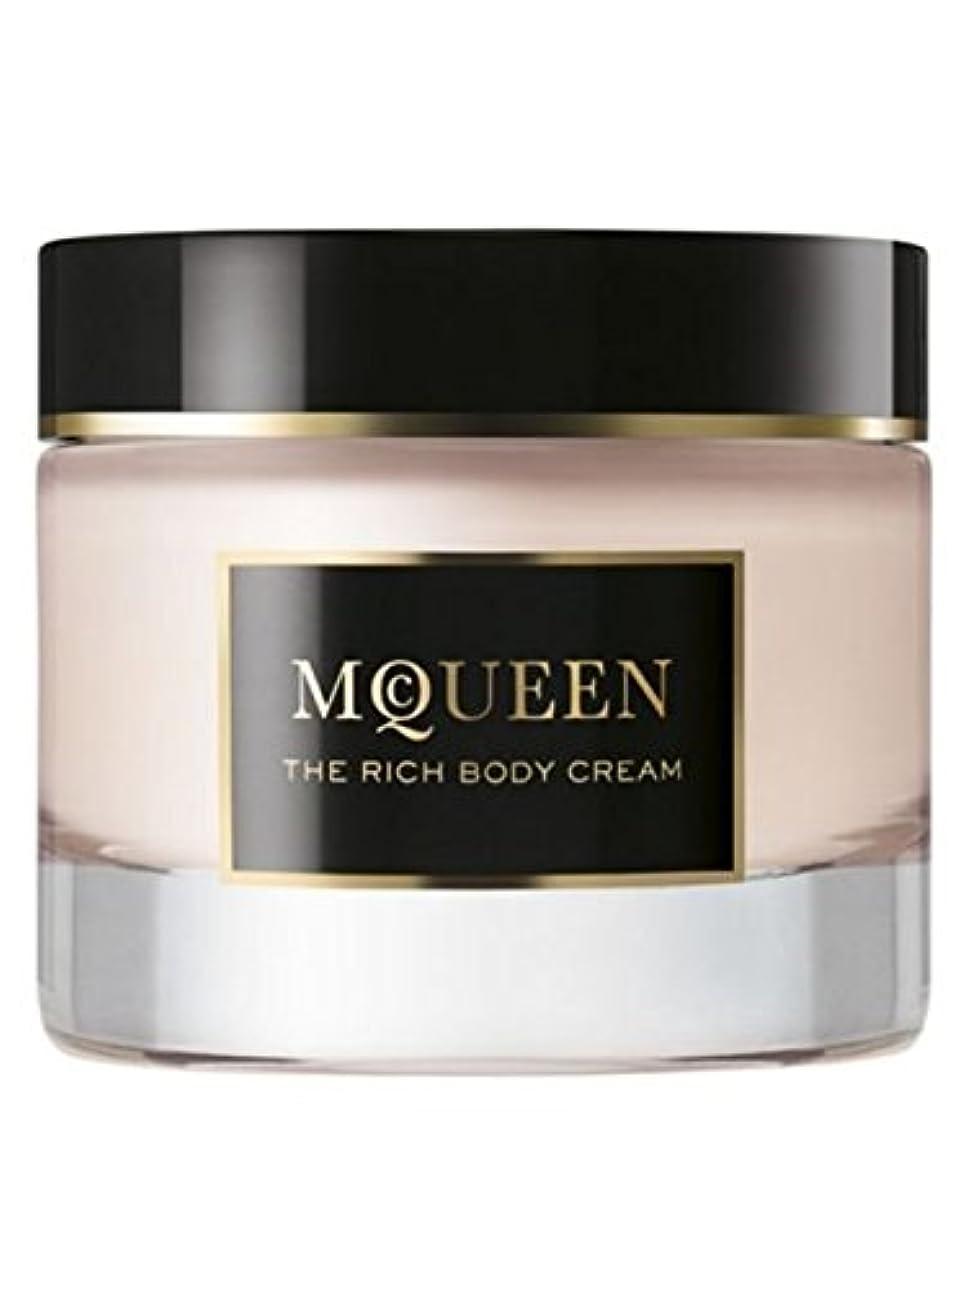 McQueen (マクイーン) 1.6 oz (50ml) Body Cream by Alexander McQueen for Women